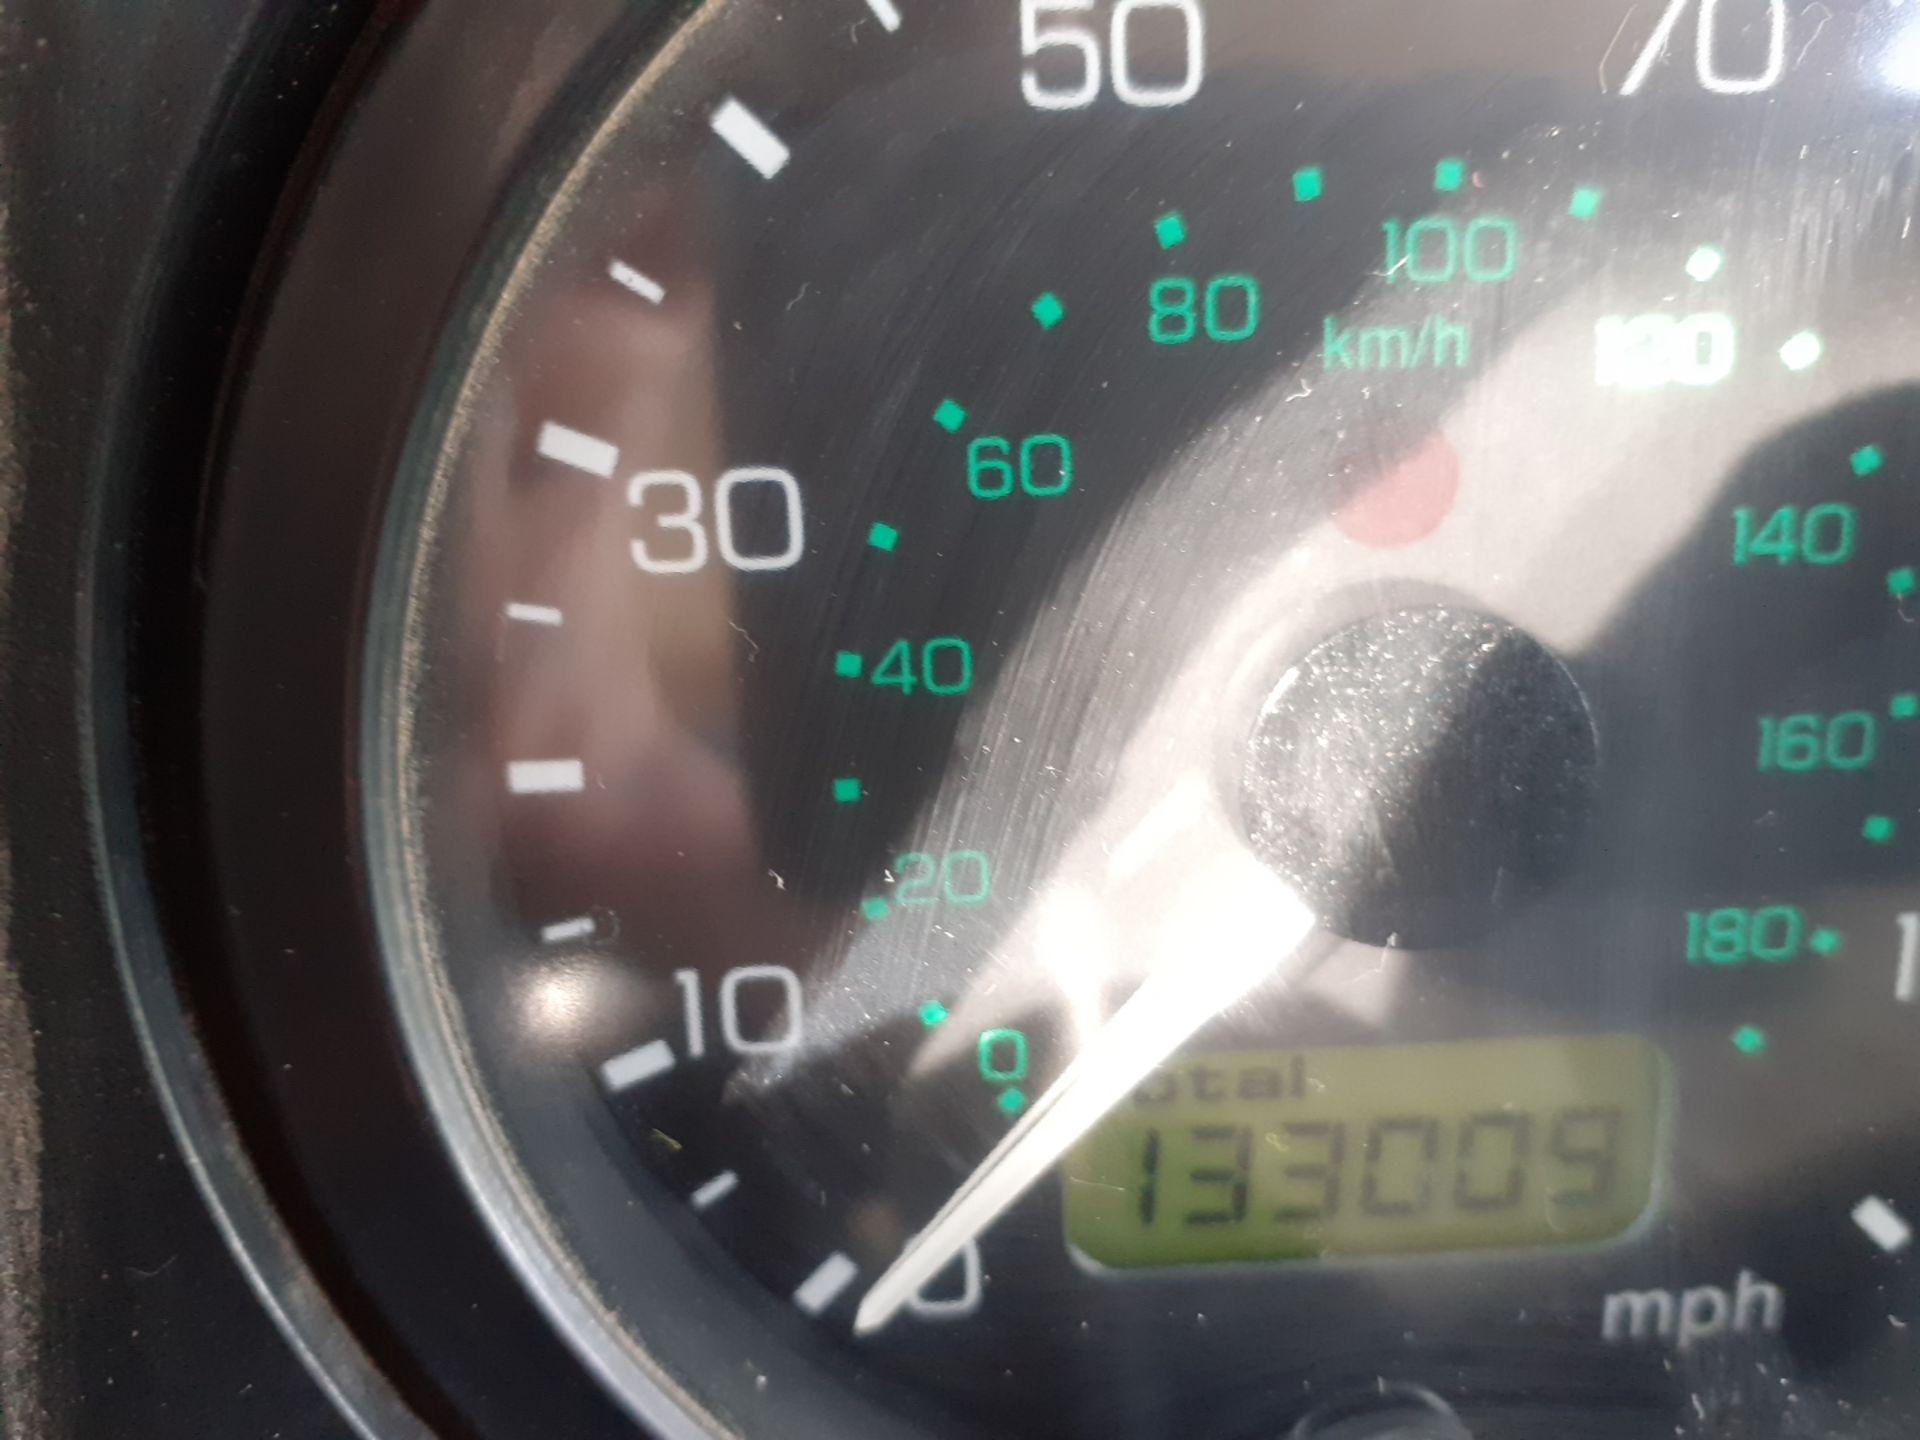 2002/51 REG LAND ROVER DEFENDER 90 PICK-UP TD5 RED 2.5 DIESEL 130 BHP, SHOWING 2 FORMER KEEPERS - Image 14 of 14